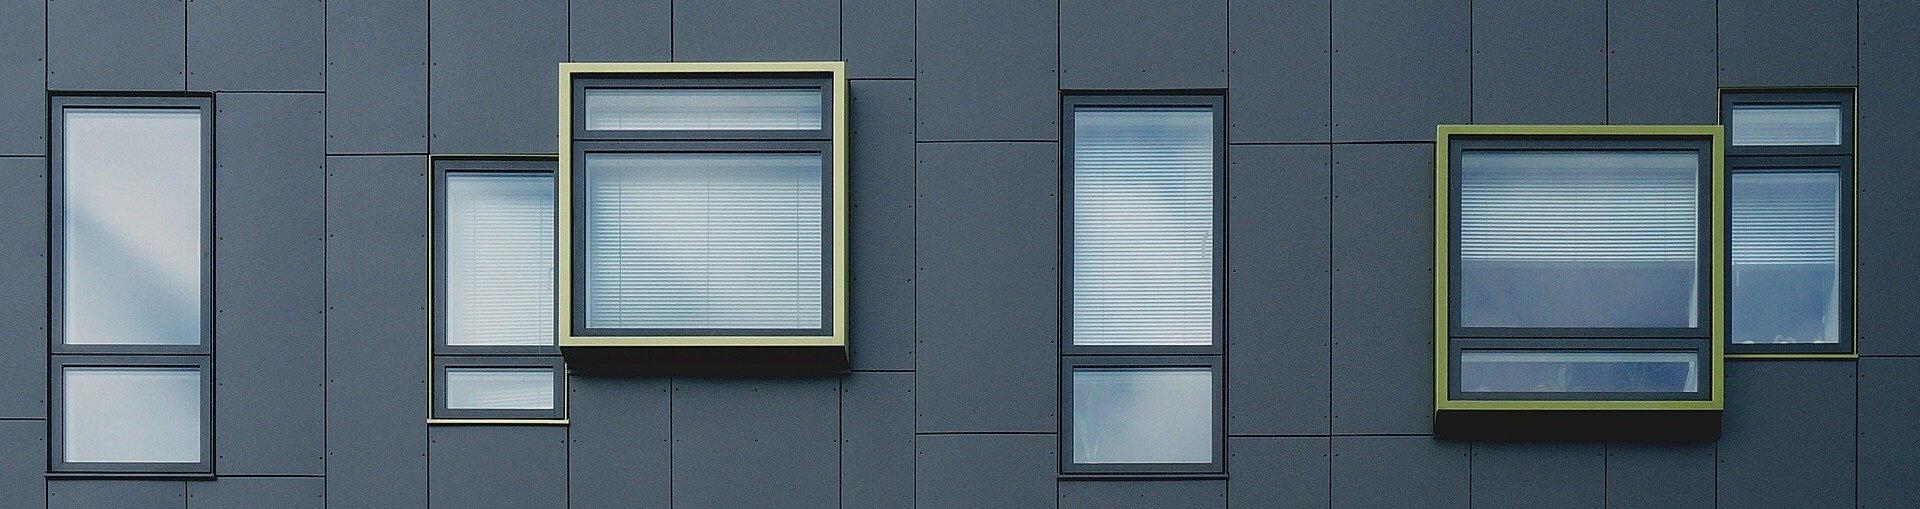 Fassade Aufhuebschen Tipps Tricks